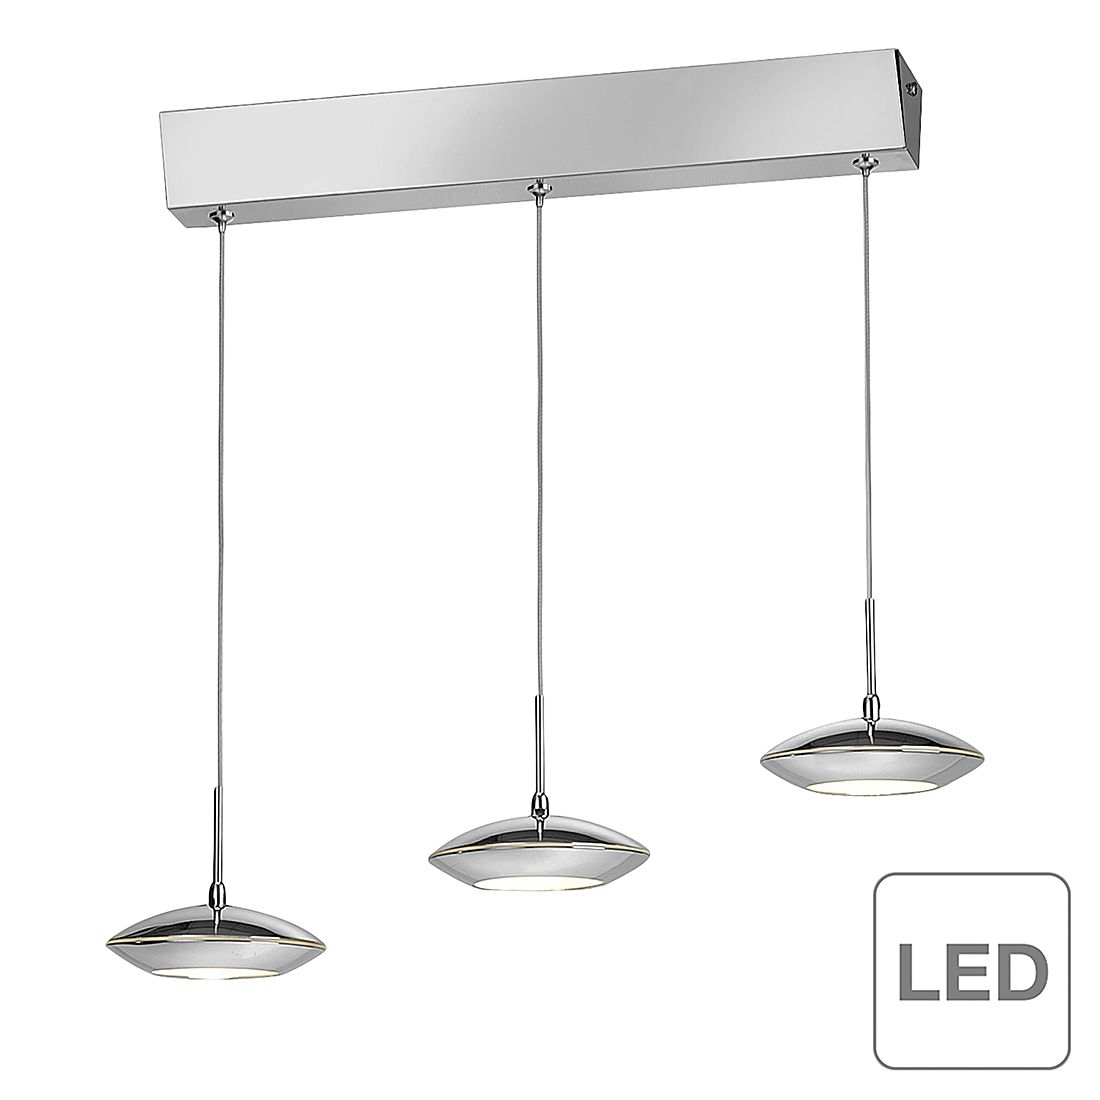 EEK A++, LED-Pendelleuchte Tebutt - Chrom/ Glas - Silber, Paul Neuhaus